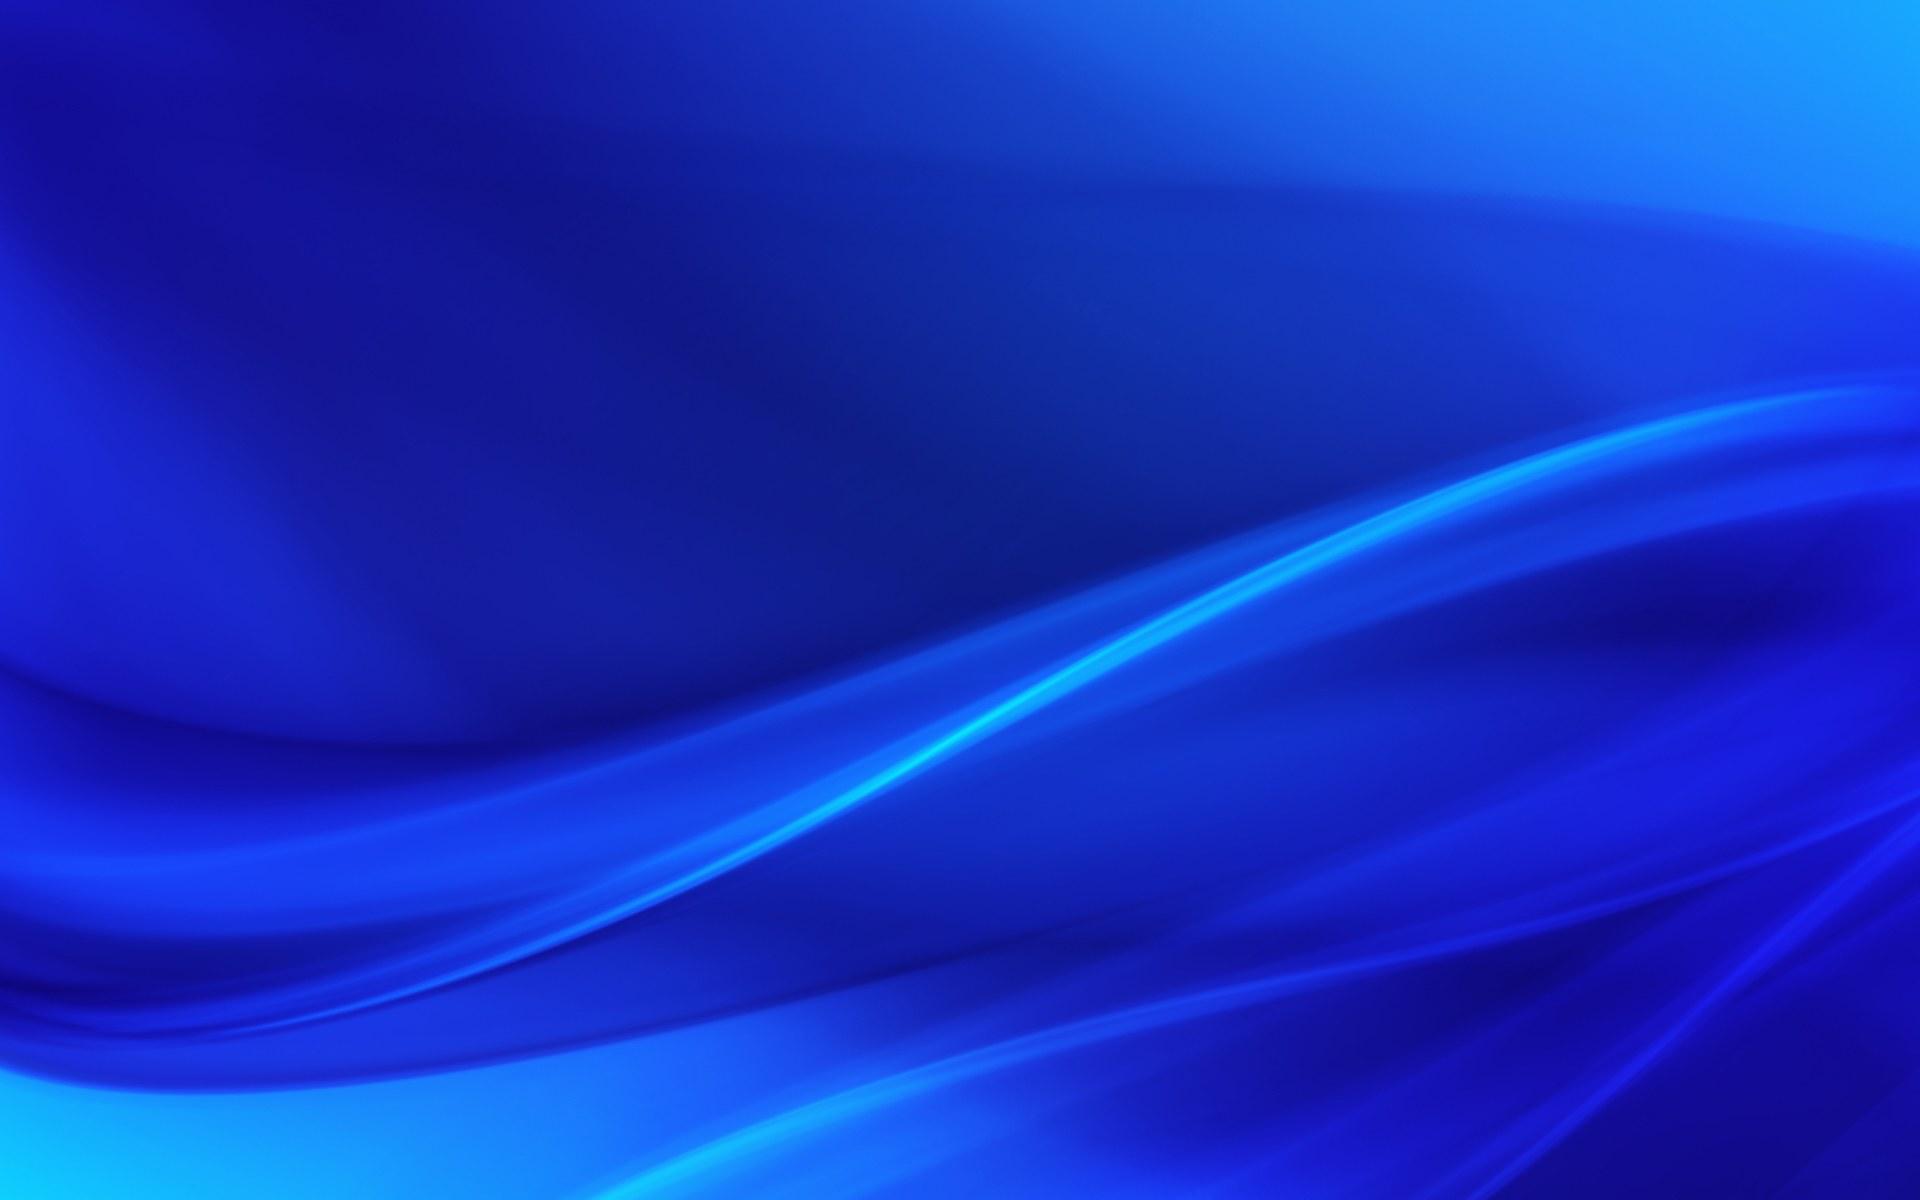 Slipknot 3d Wallpaper Blue Backgrounds Wallpaper 1920x1200 1267